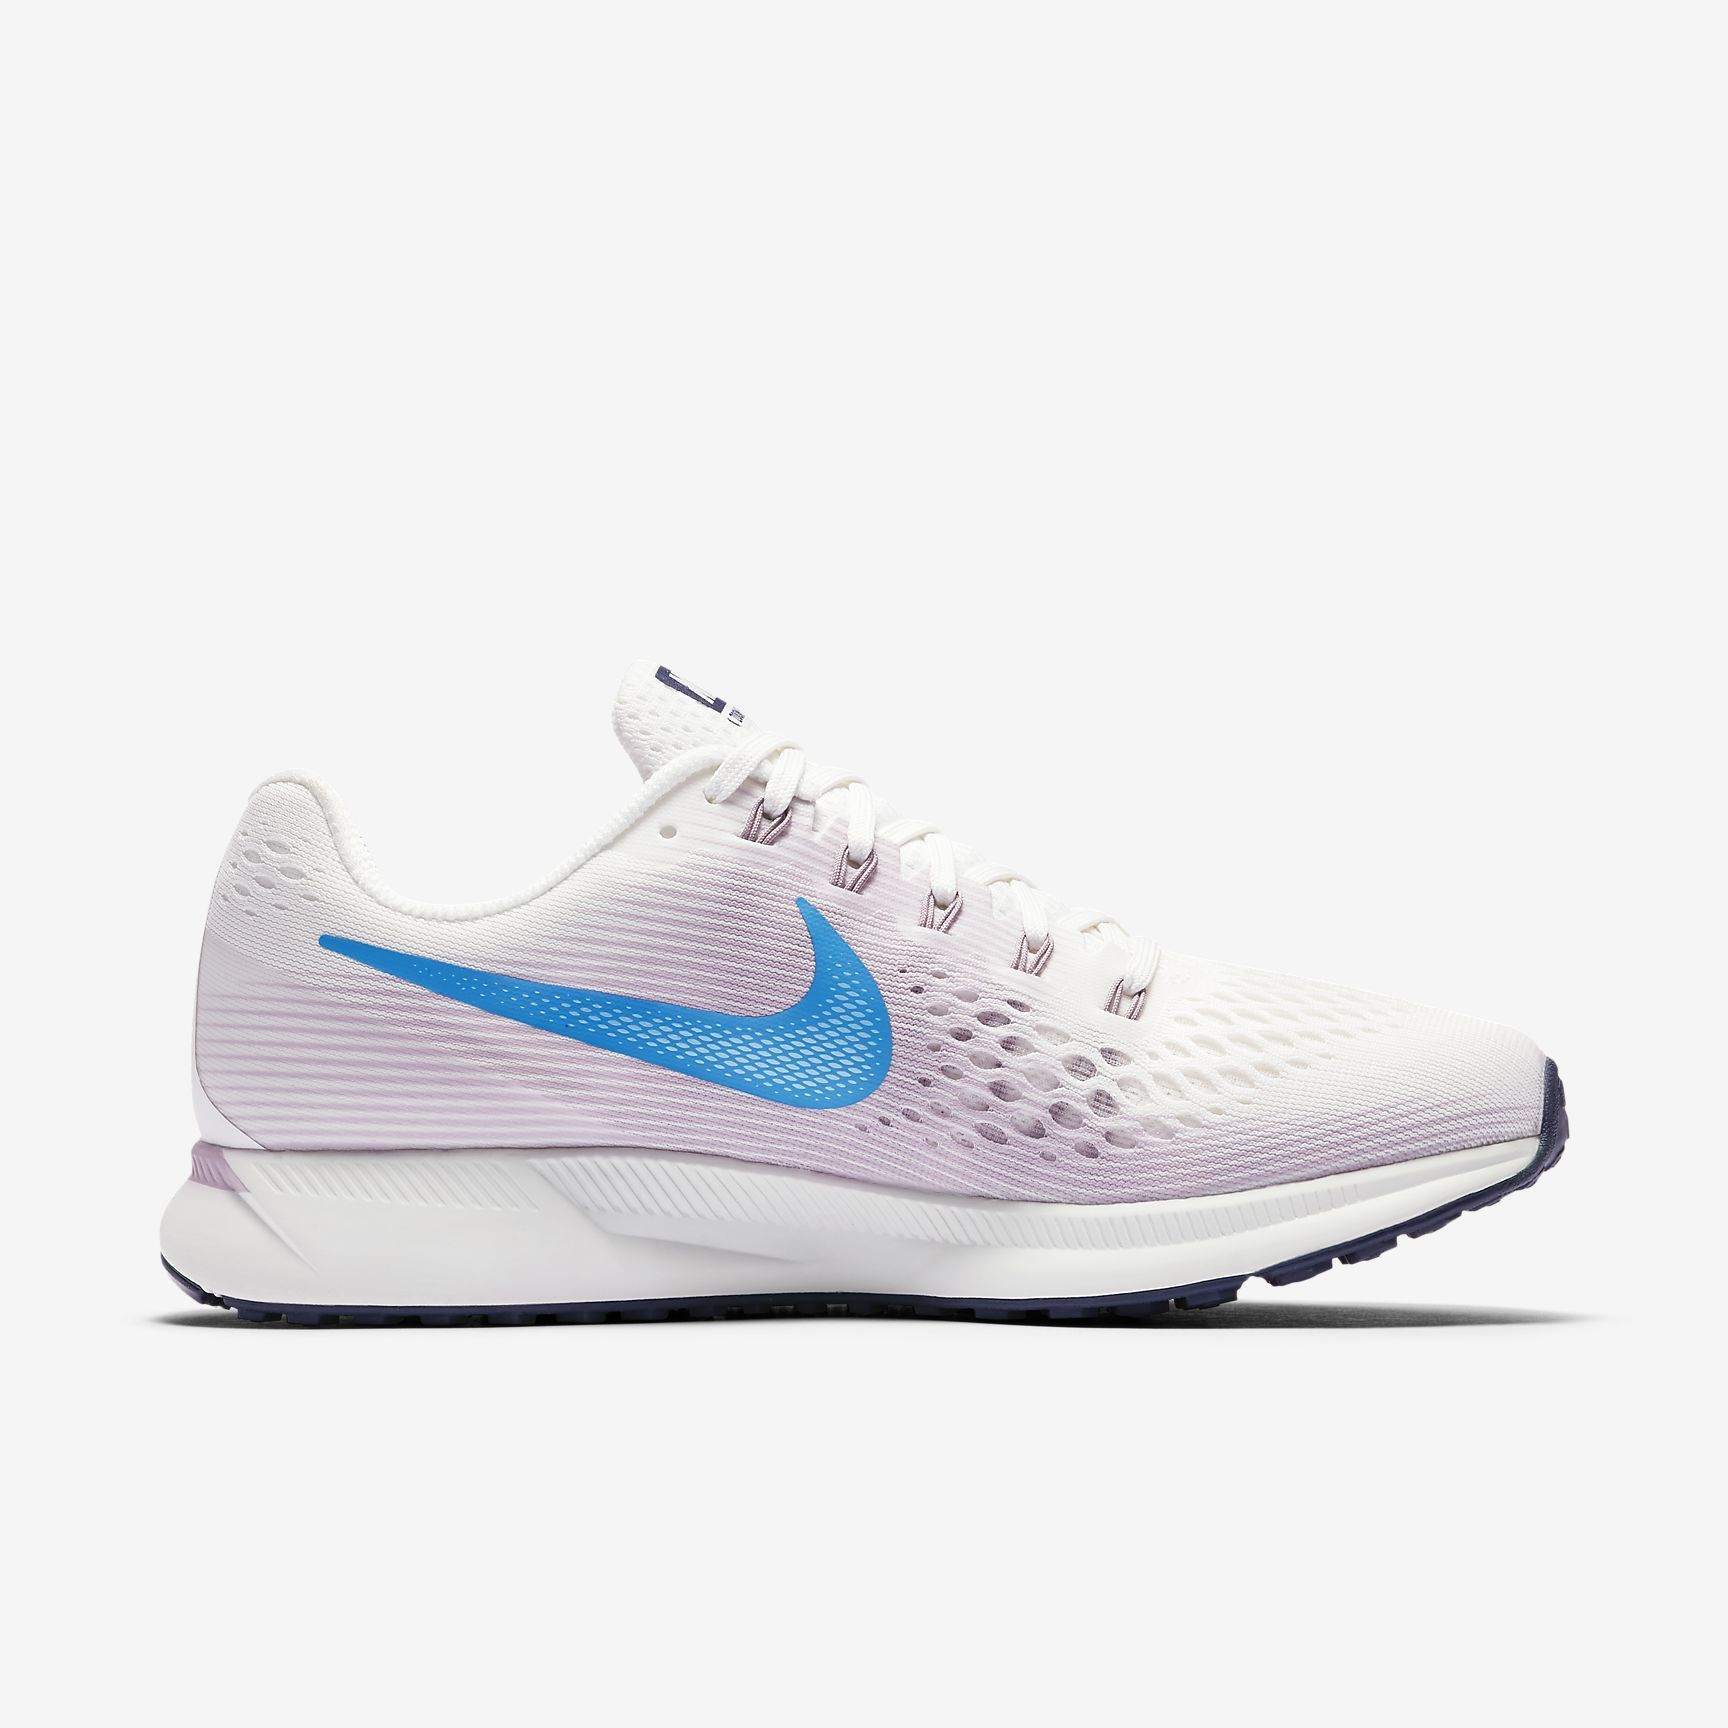 Nike Lady Air Zoom Pegasus 34 in Grau Blau